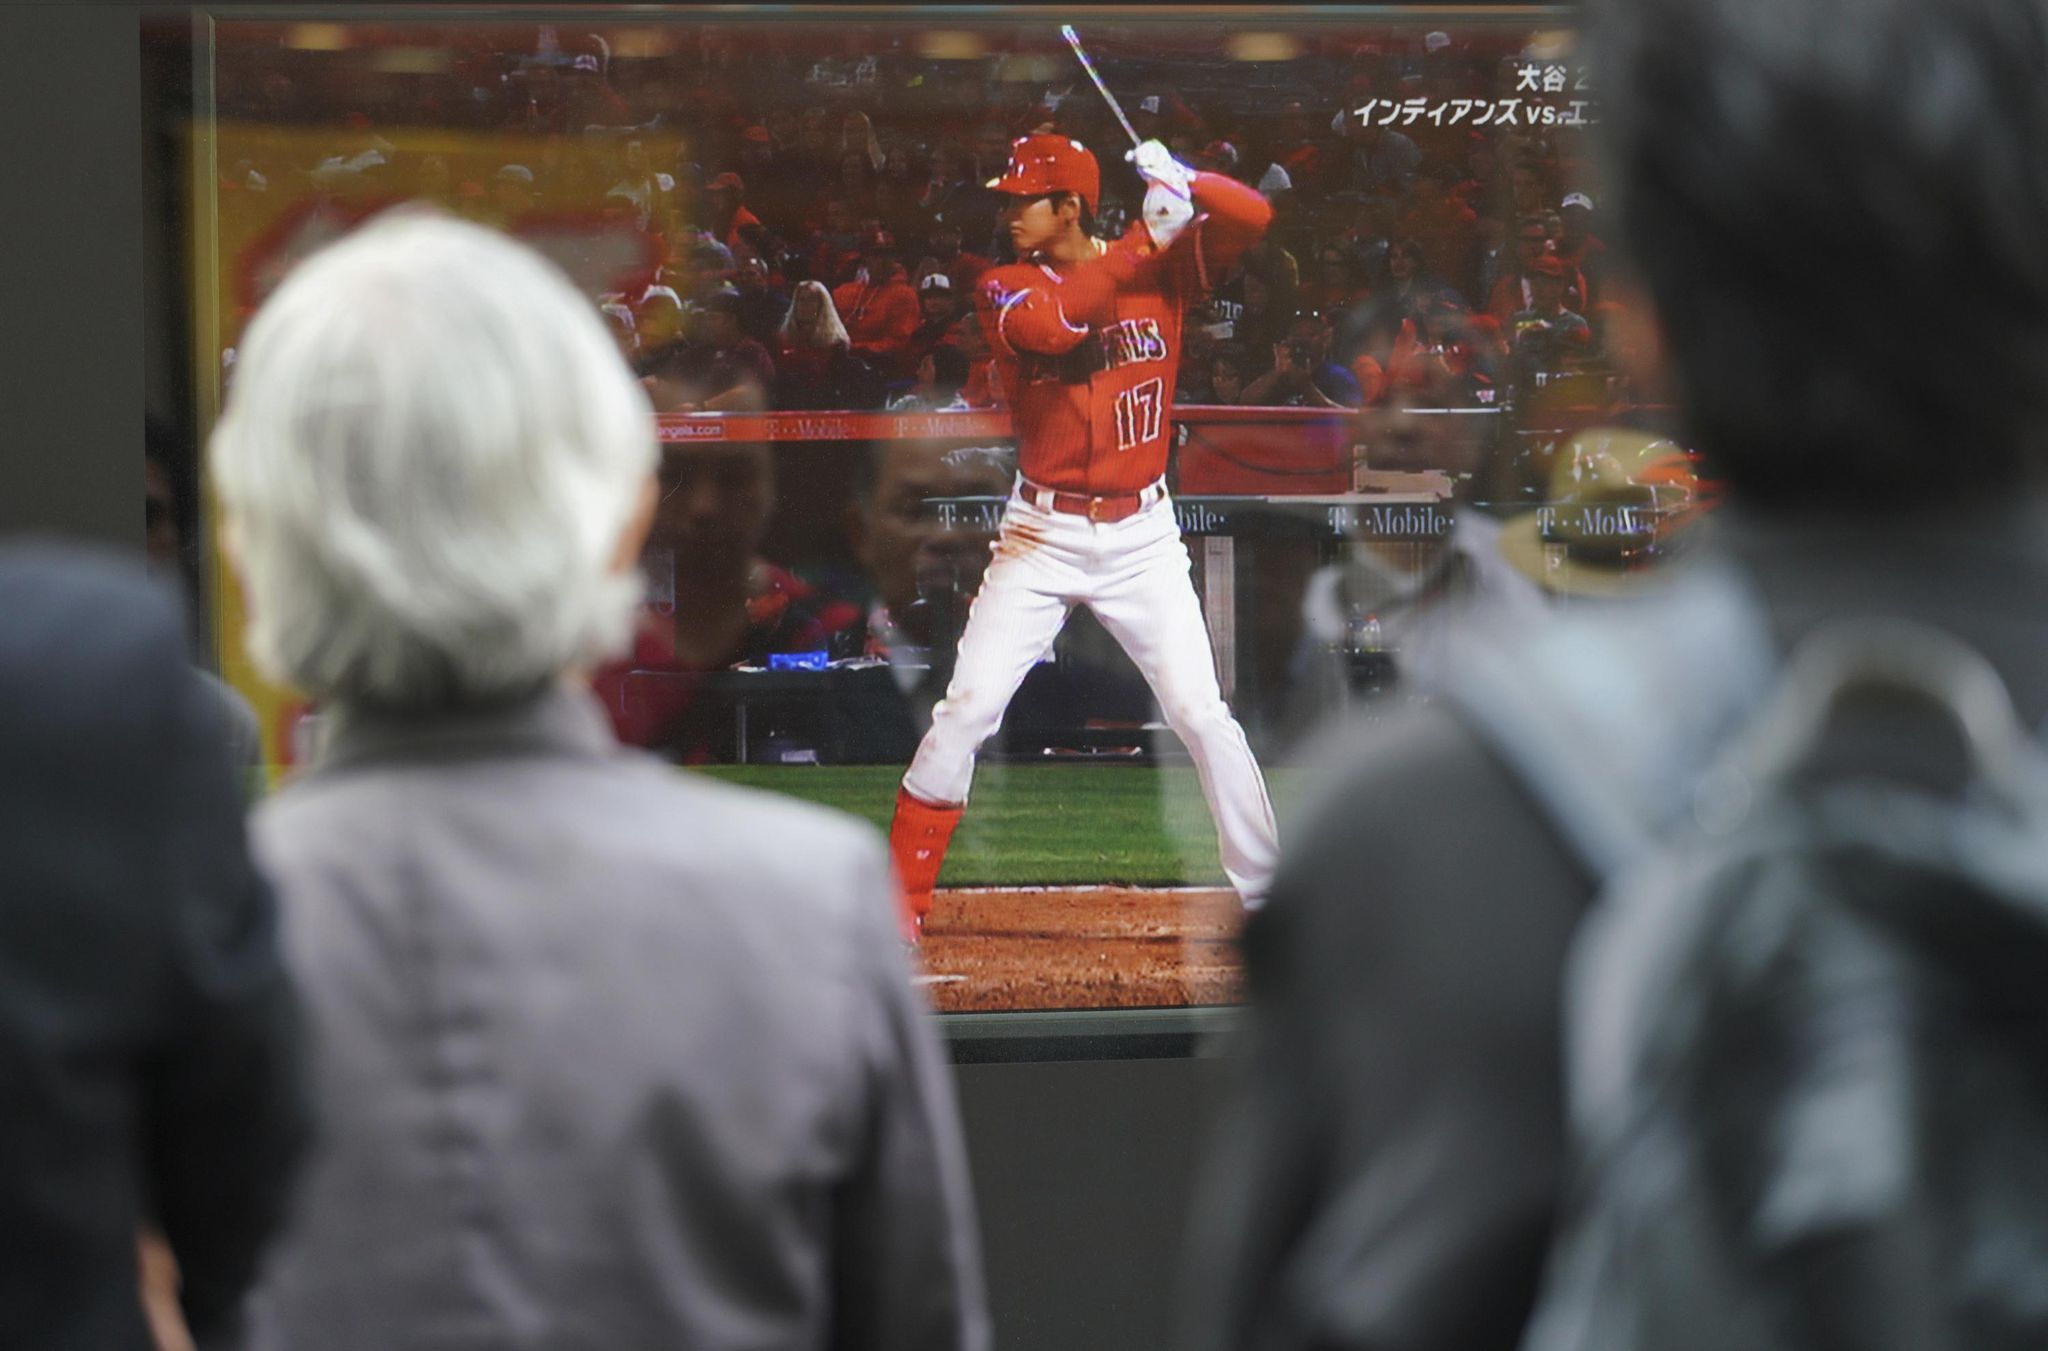 Baseball_ohtani_japan_reaction_39629_s2048x1351